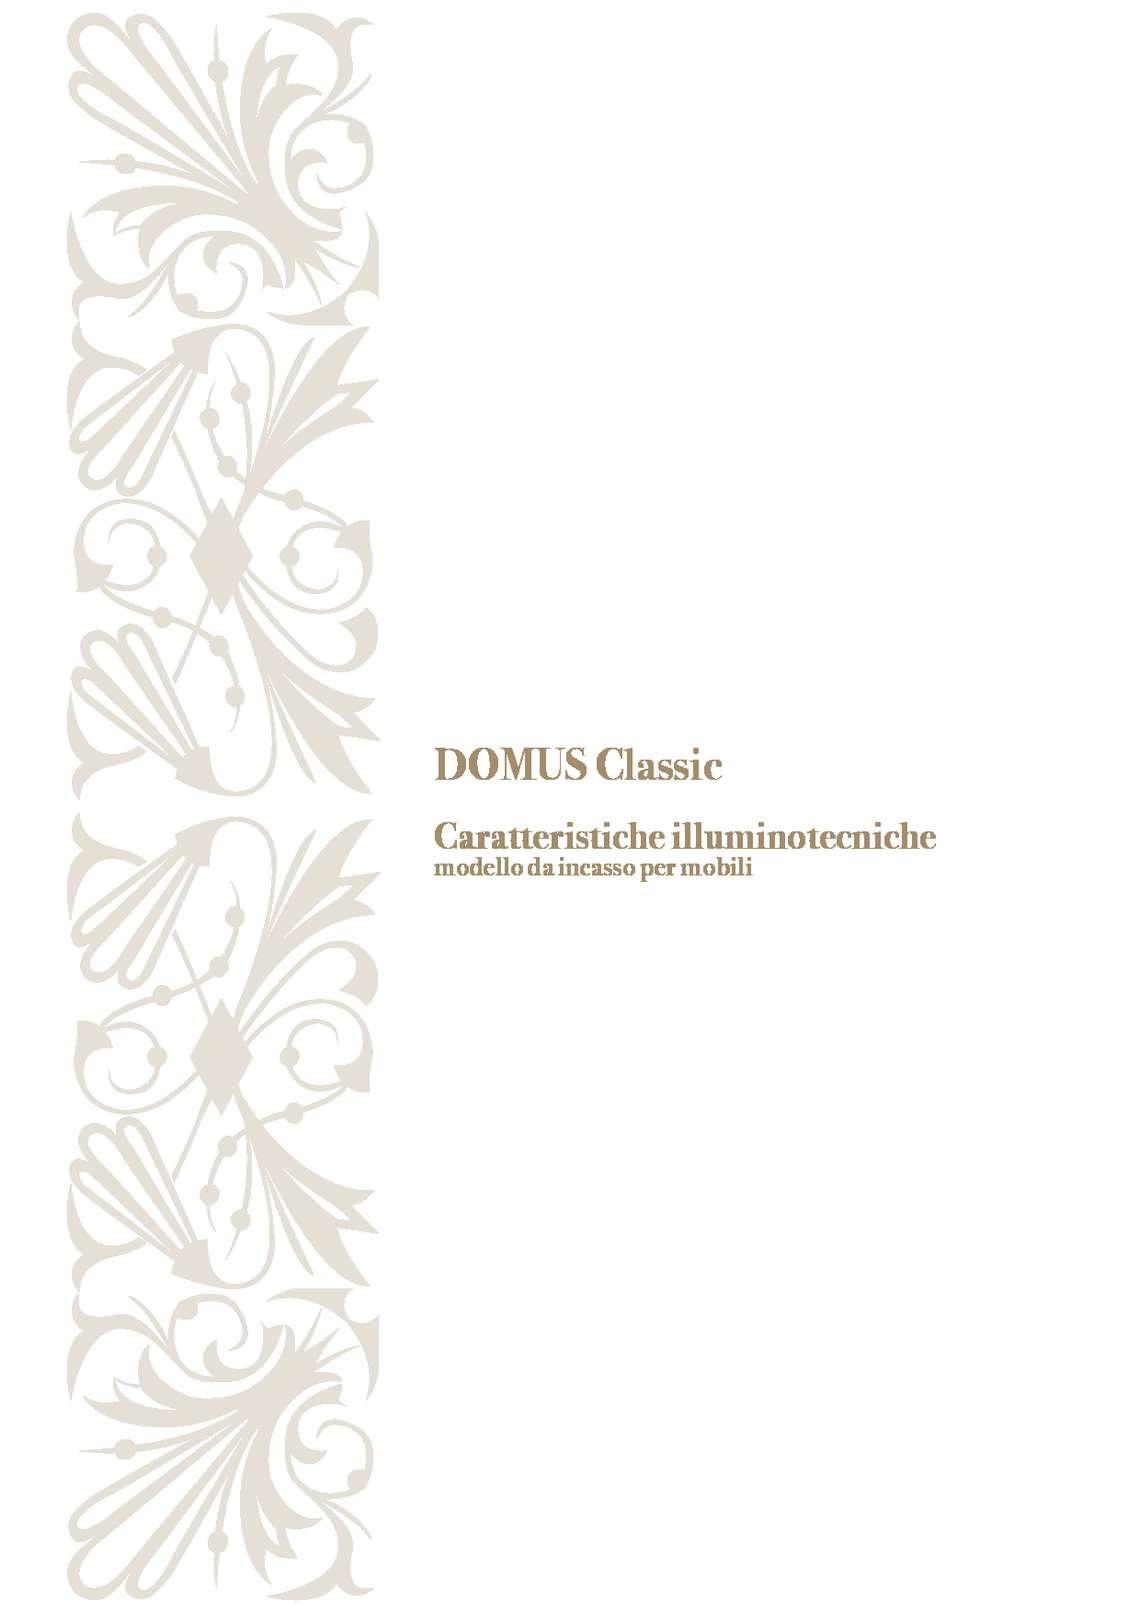 domus-line-classic_25_033.jpg